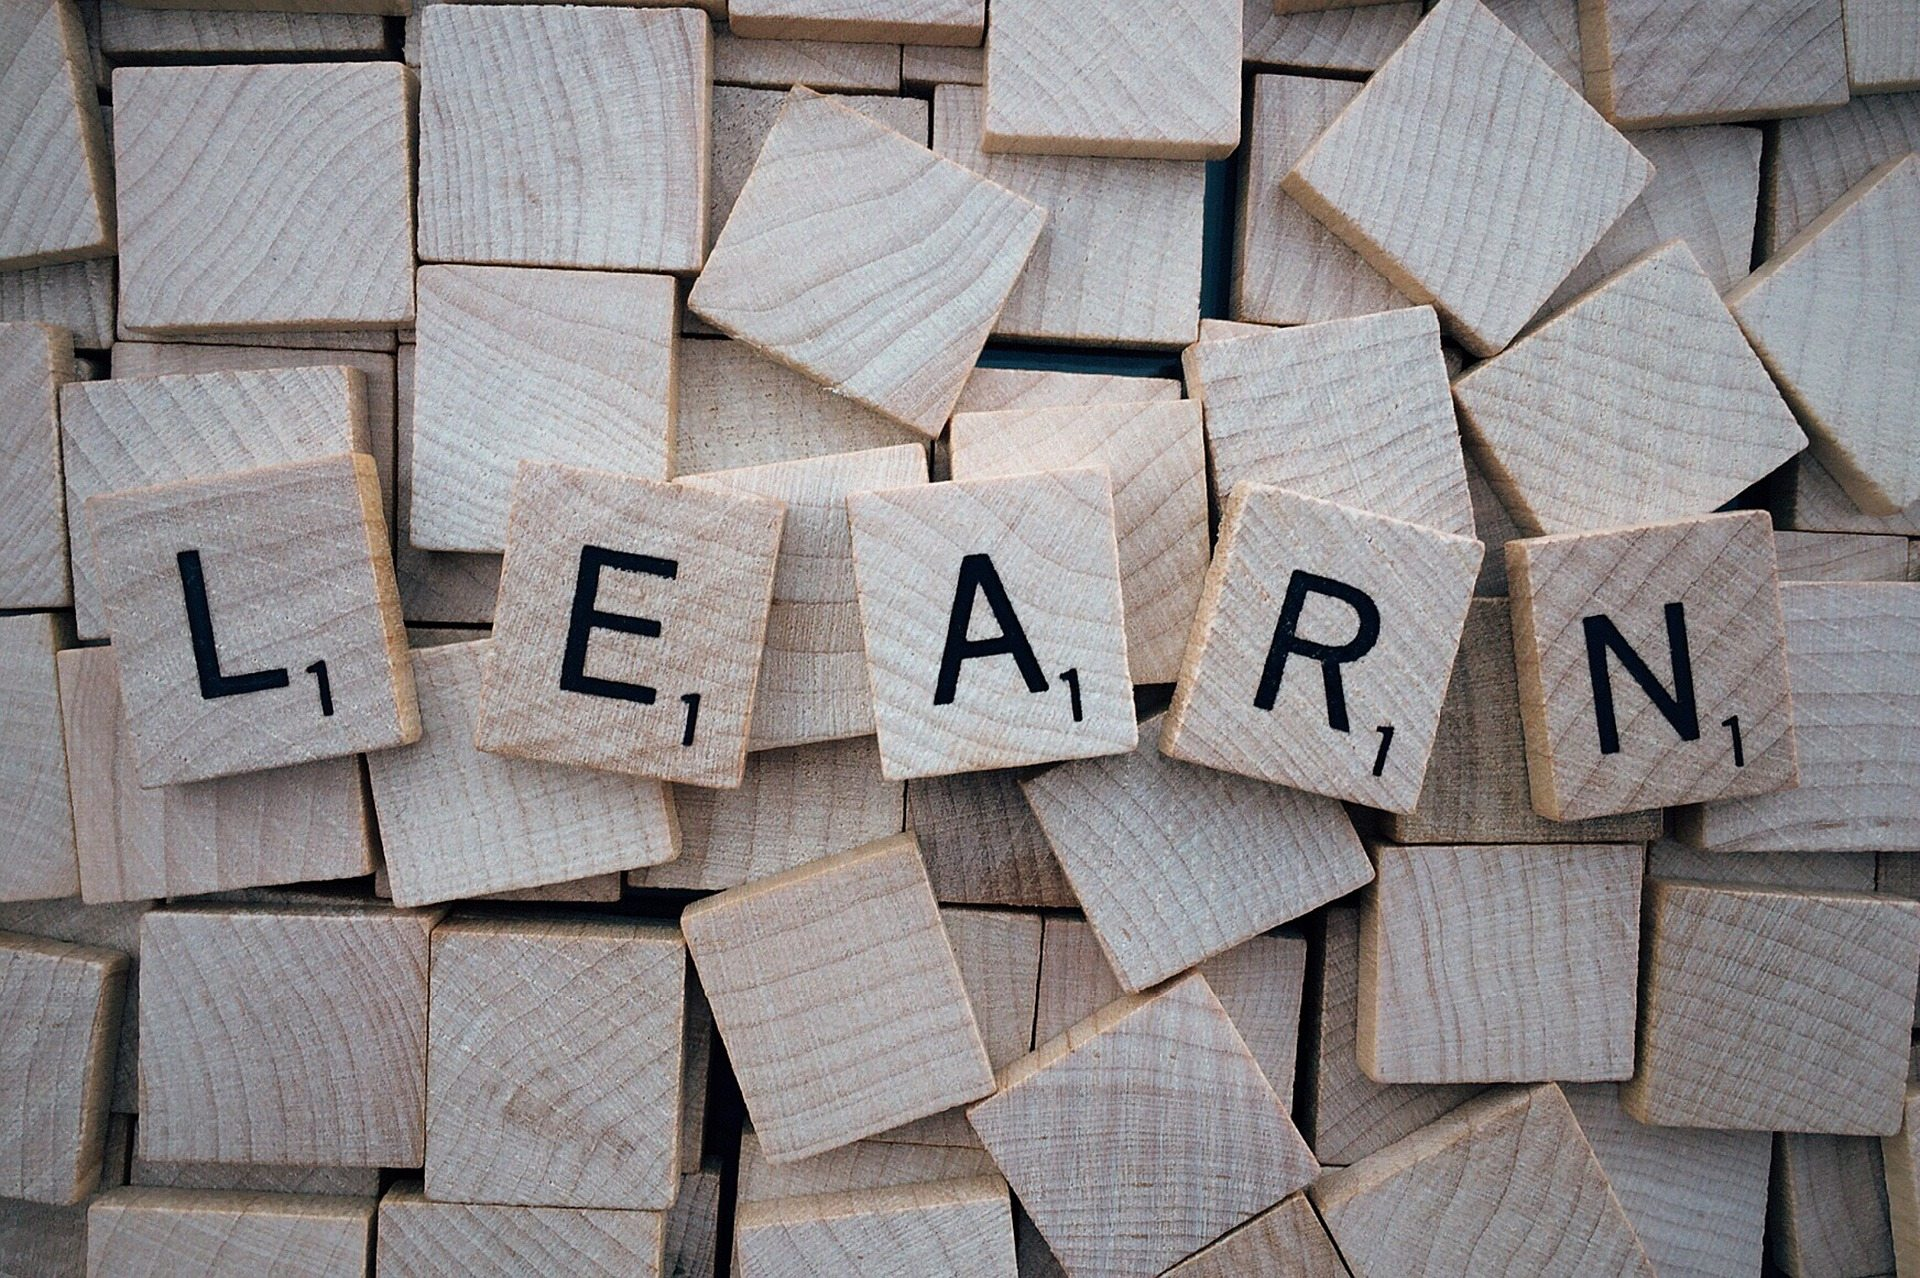 learn-1820039_1920 Pixabay